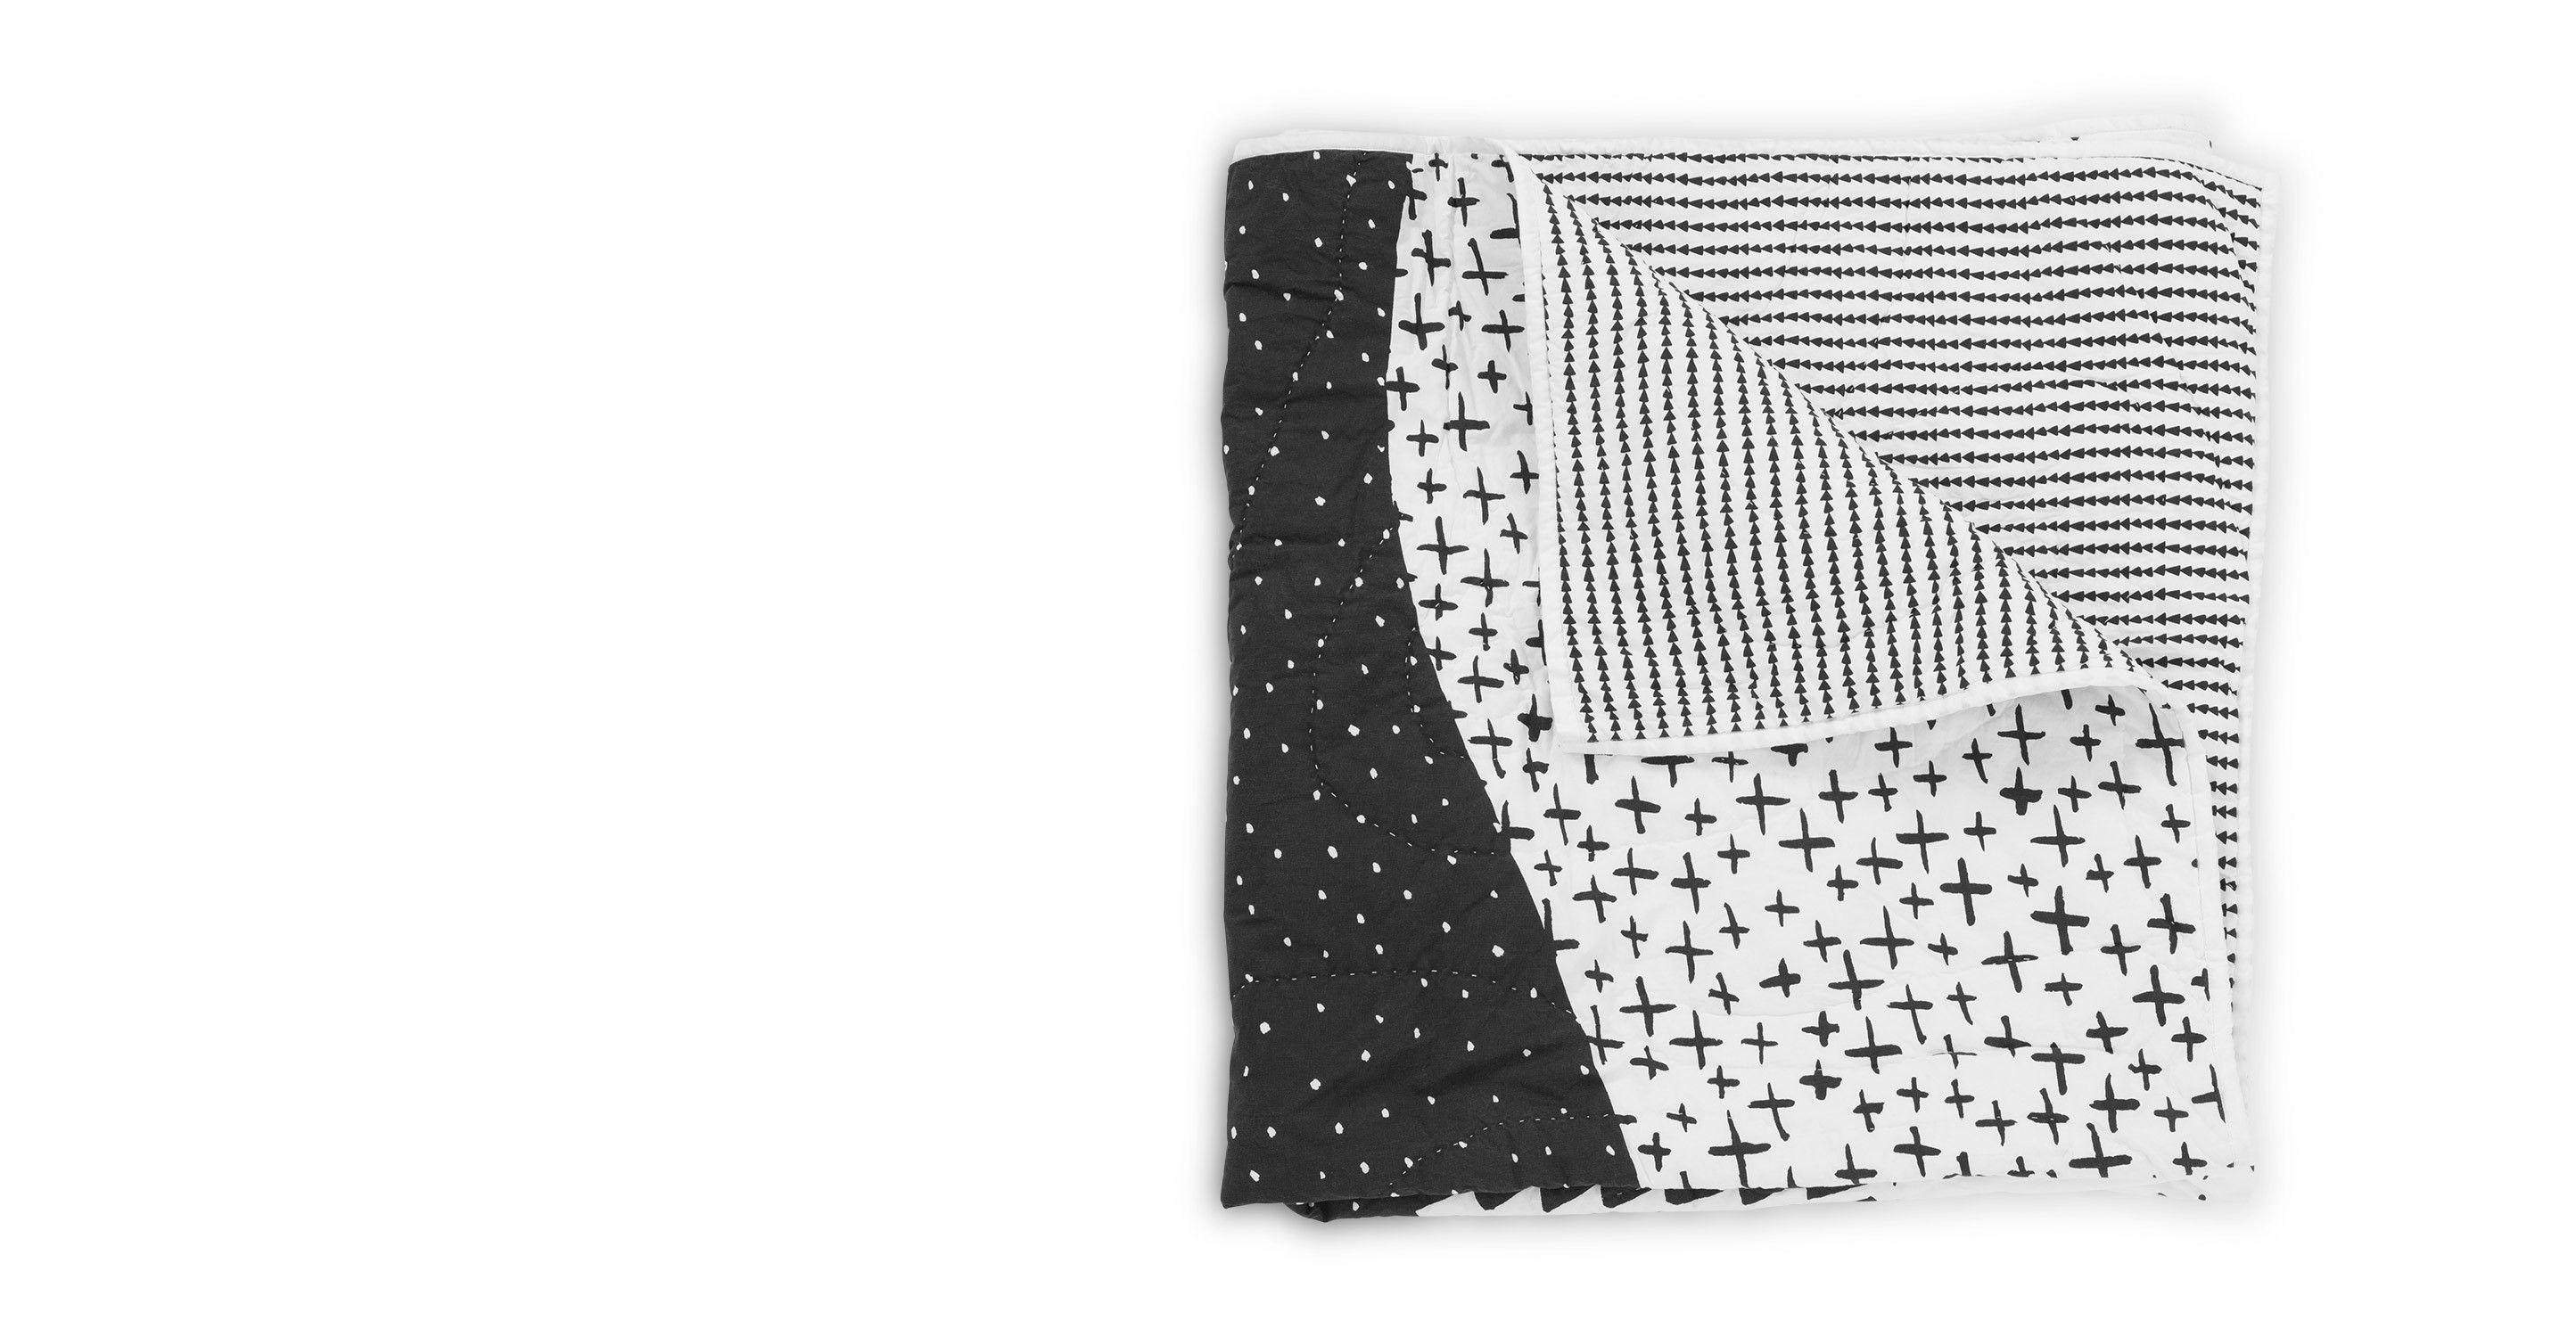 Iso sprei 180 x 130cm, zwart-wit